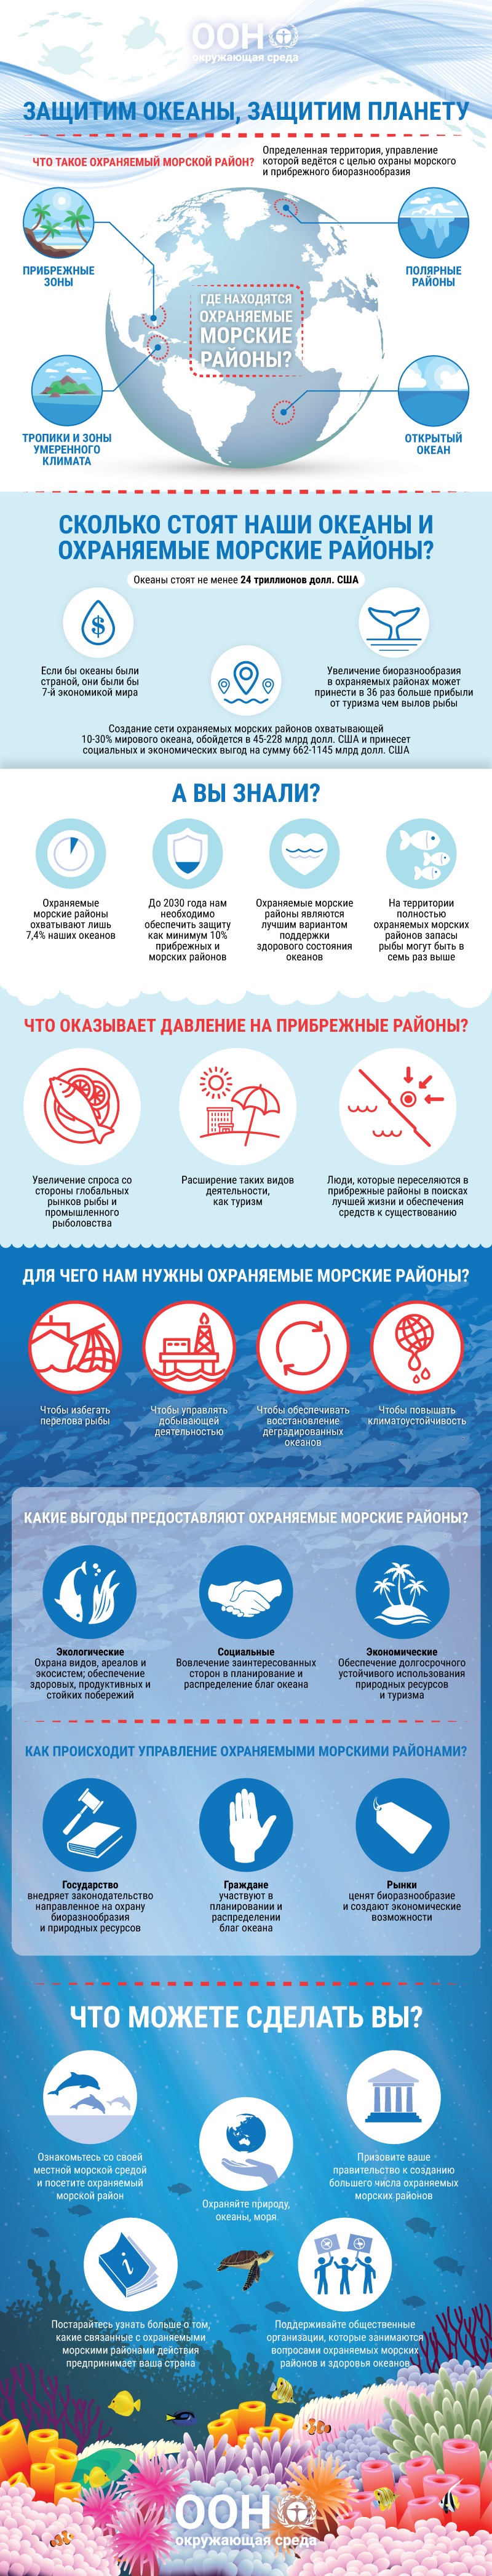 RU_MPAs_infographic.jpg